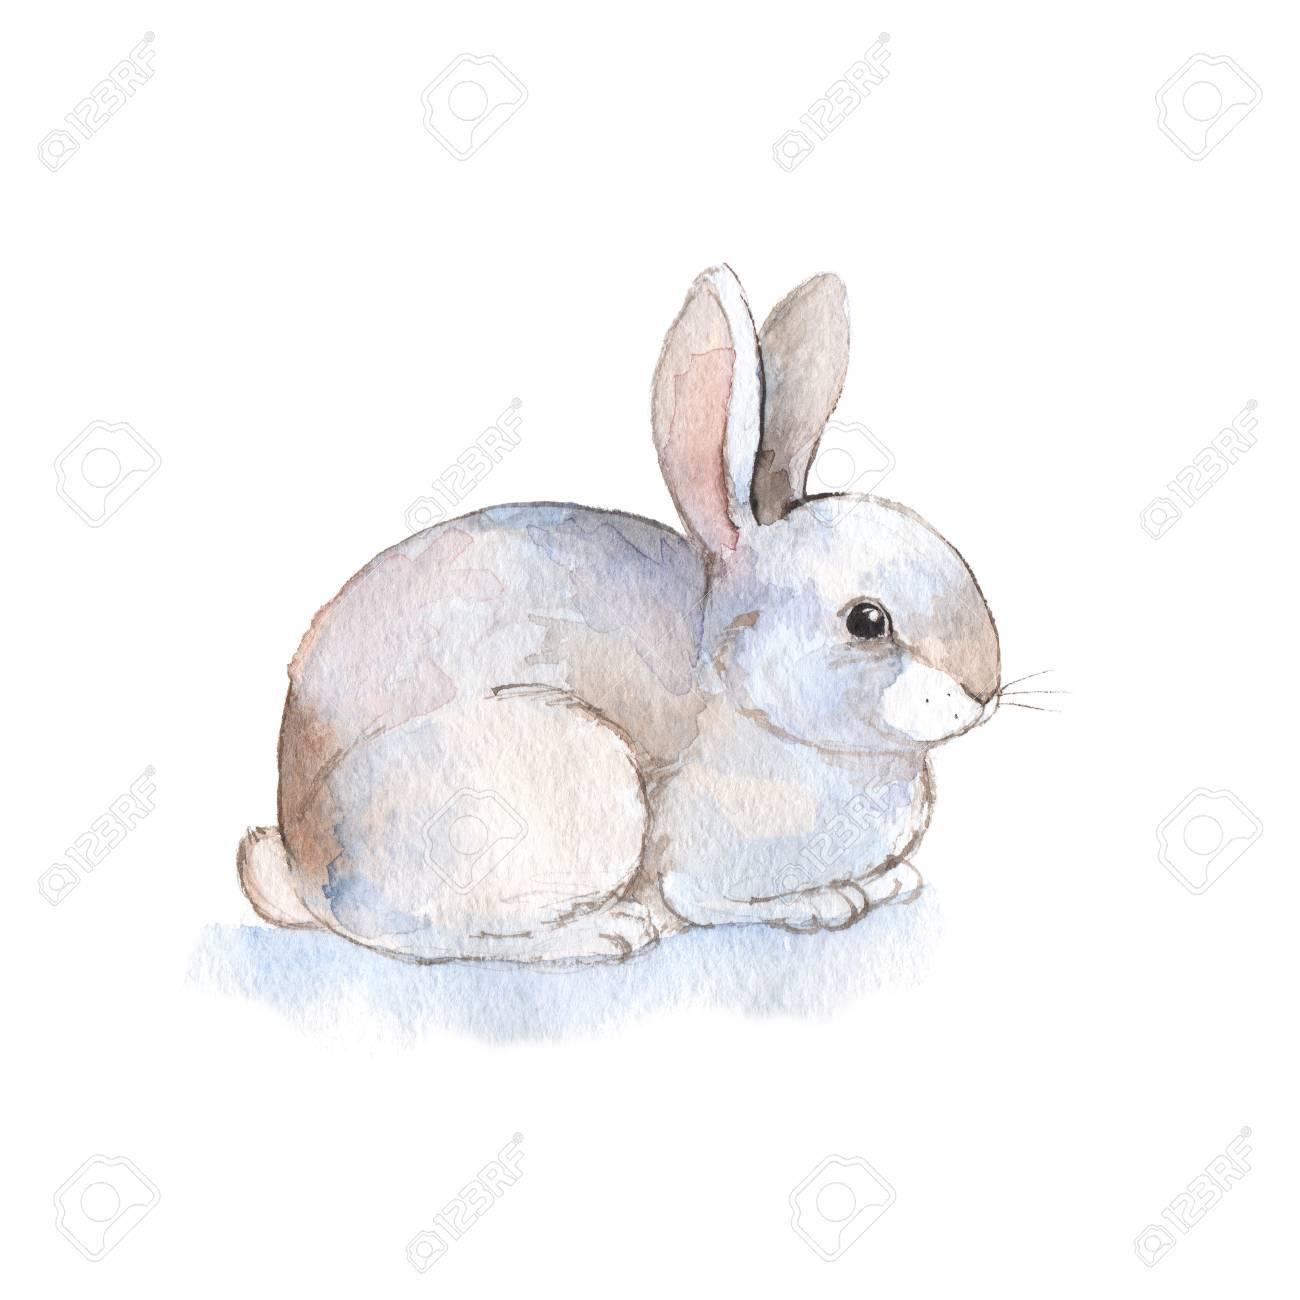 White rabbit 2. Watercolor illustration. Hand-drawn - 56251312